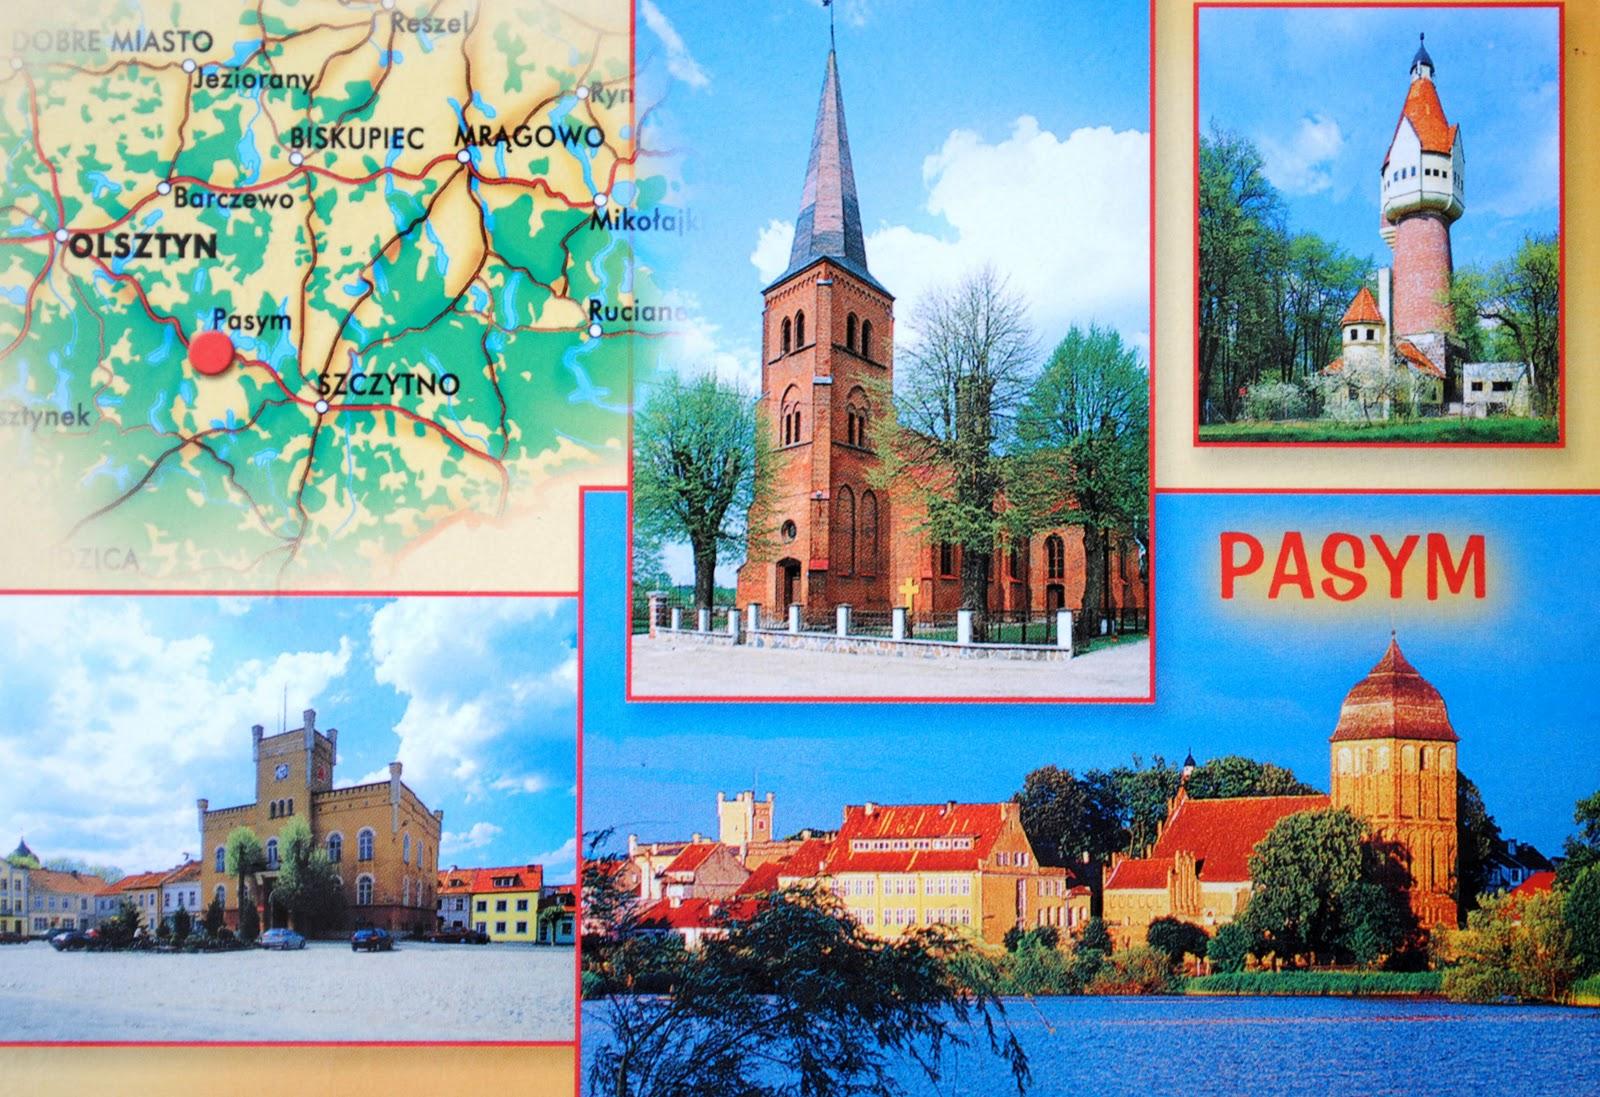 polski pasym